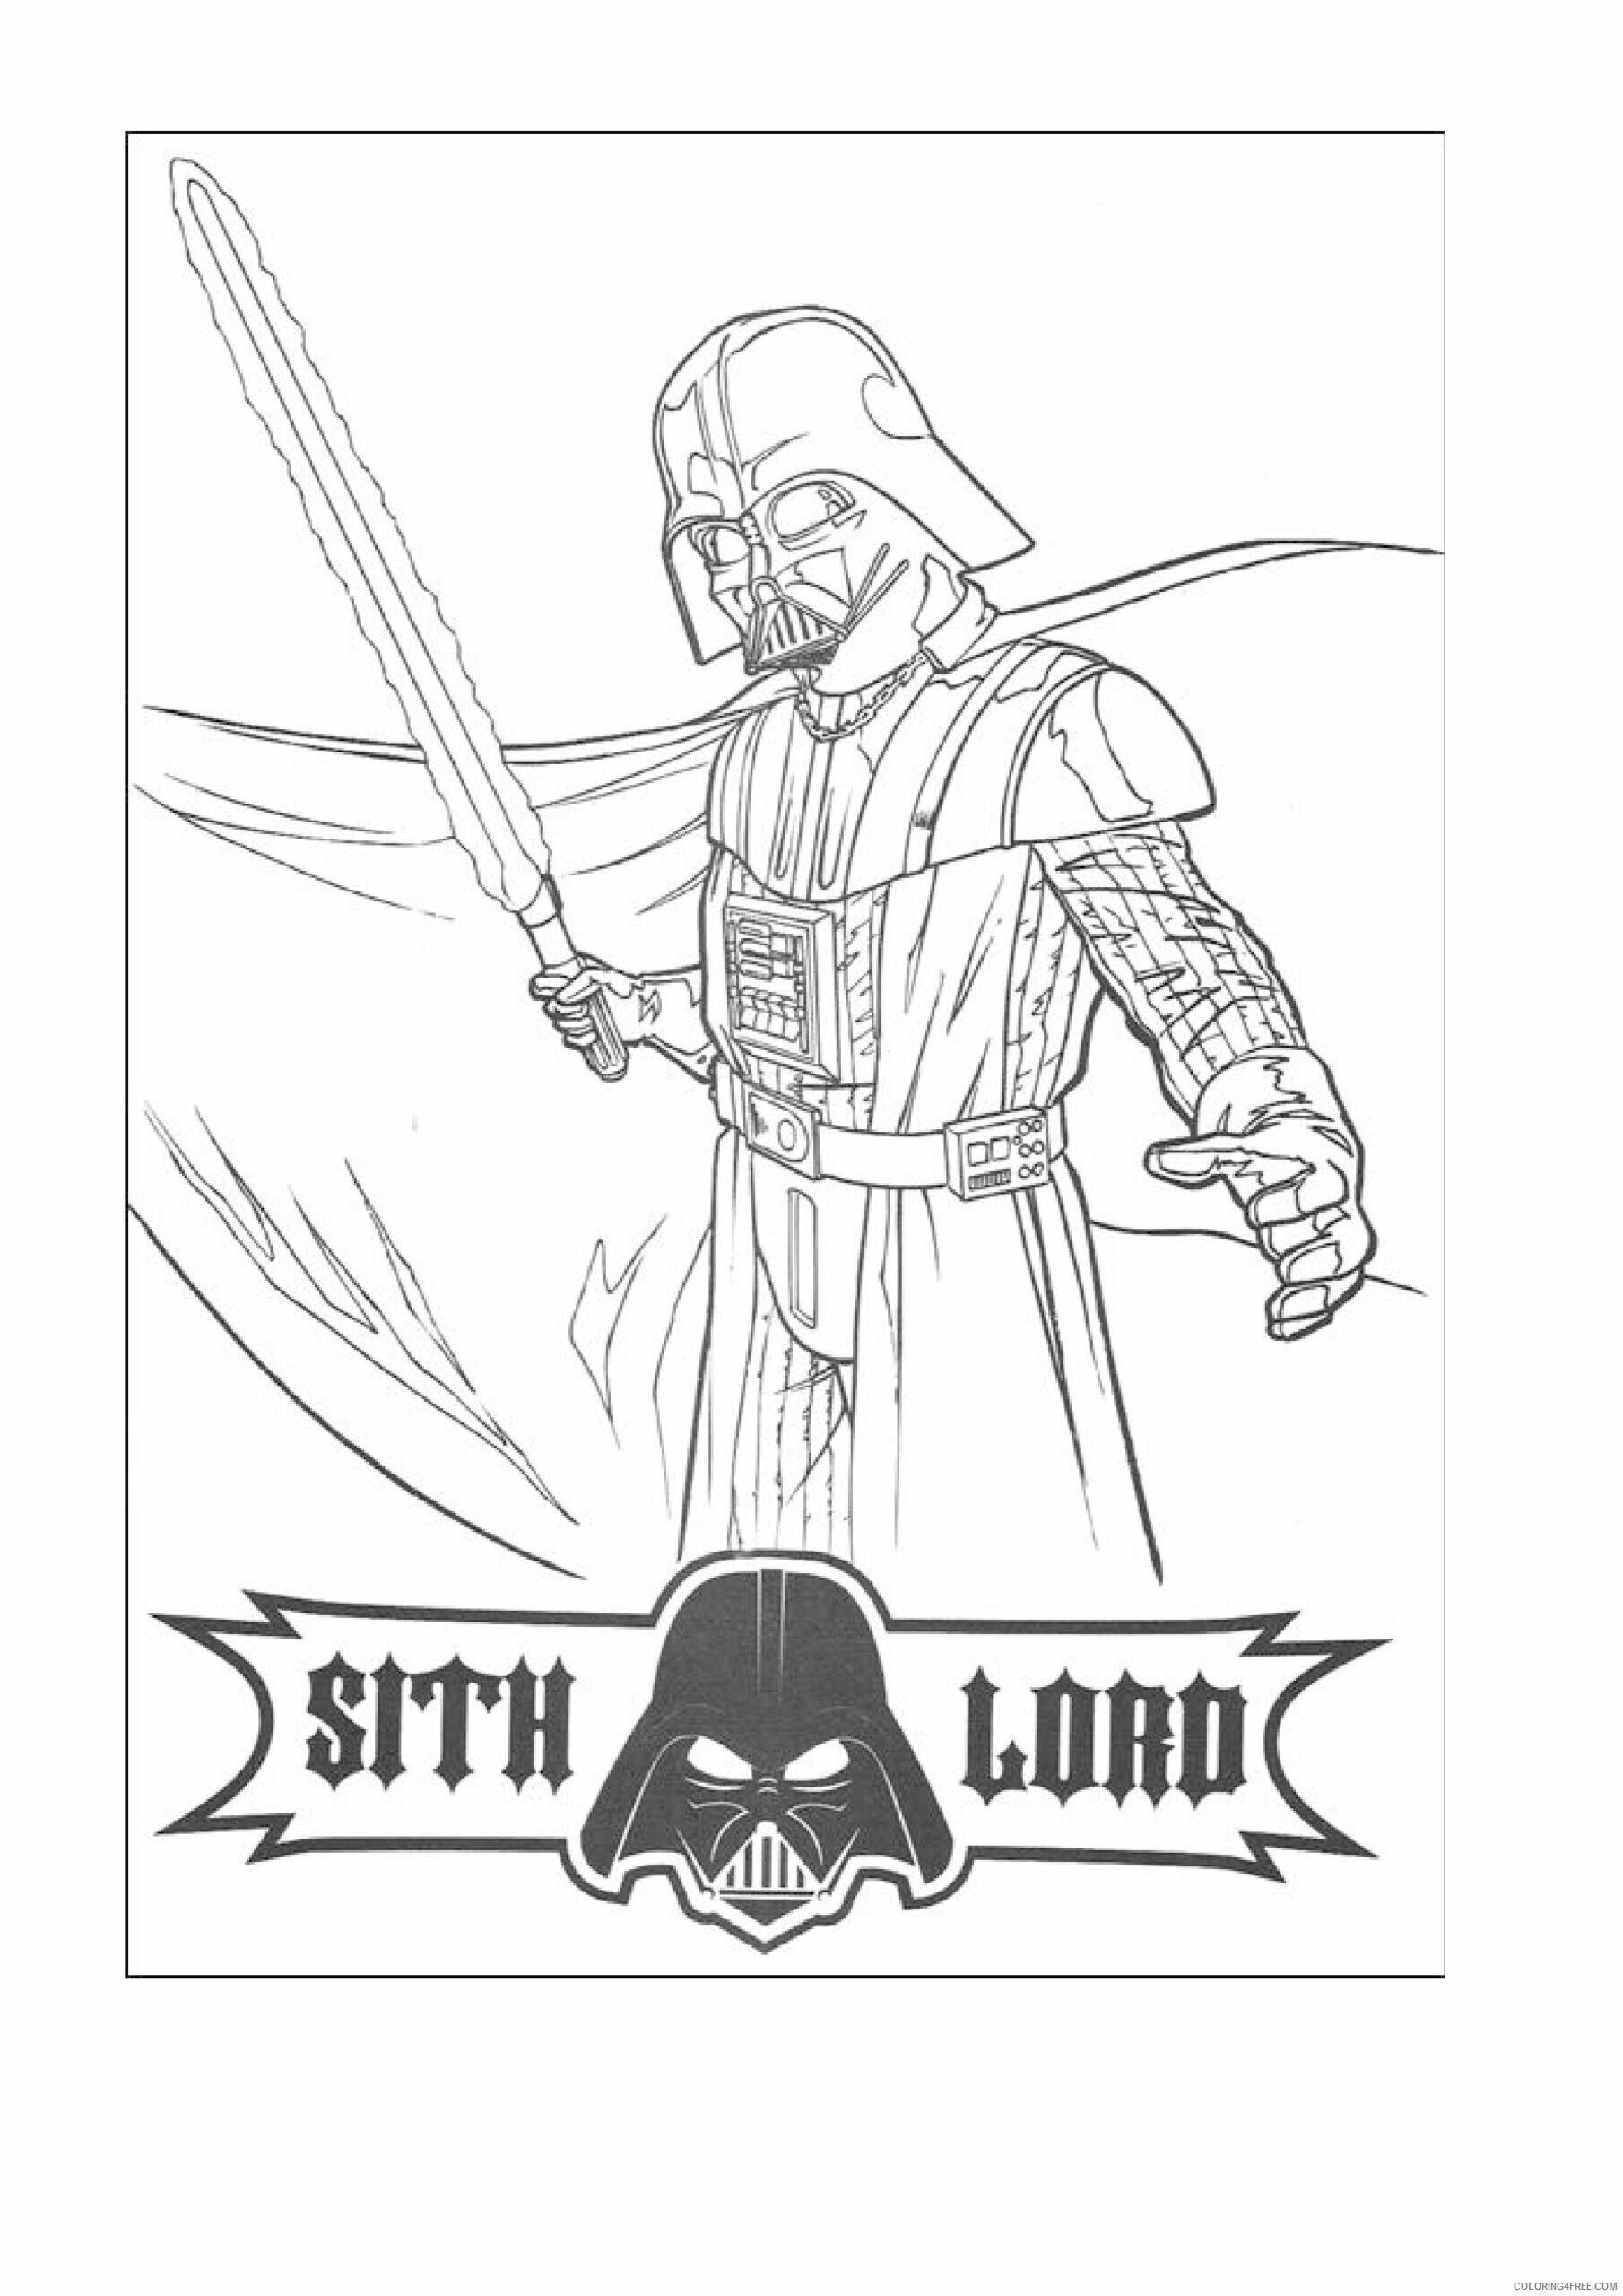 Star Wars Coloring Pages TV Film Star Wars Kids Printable 2020 08029 Coloring4free